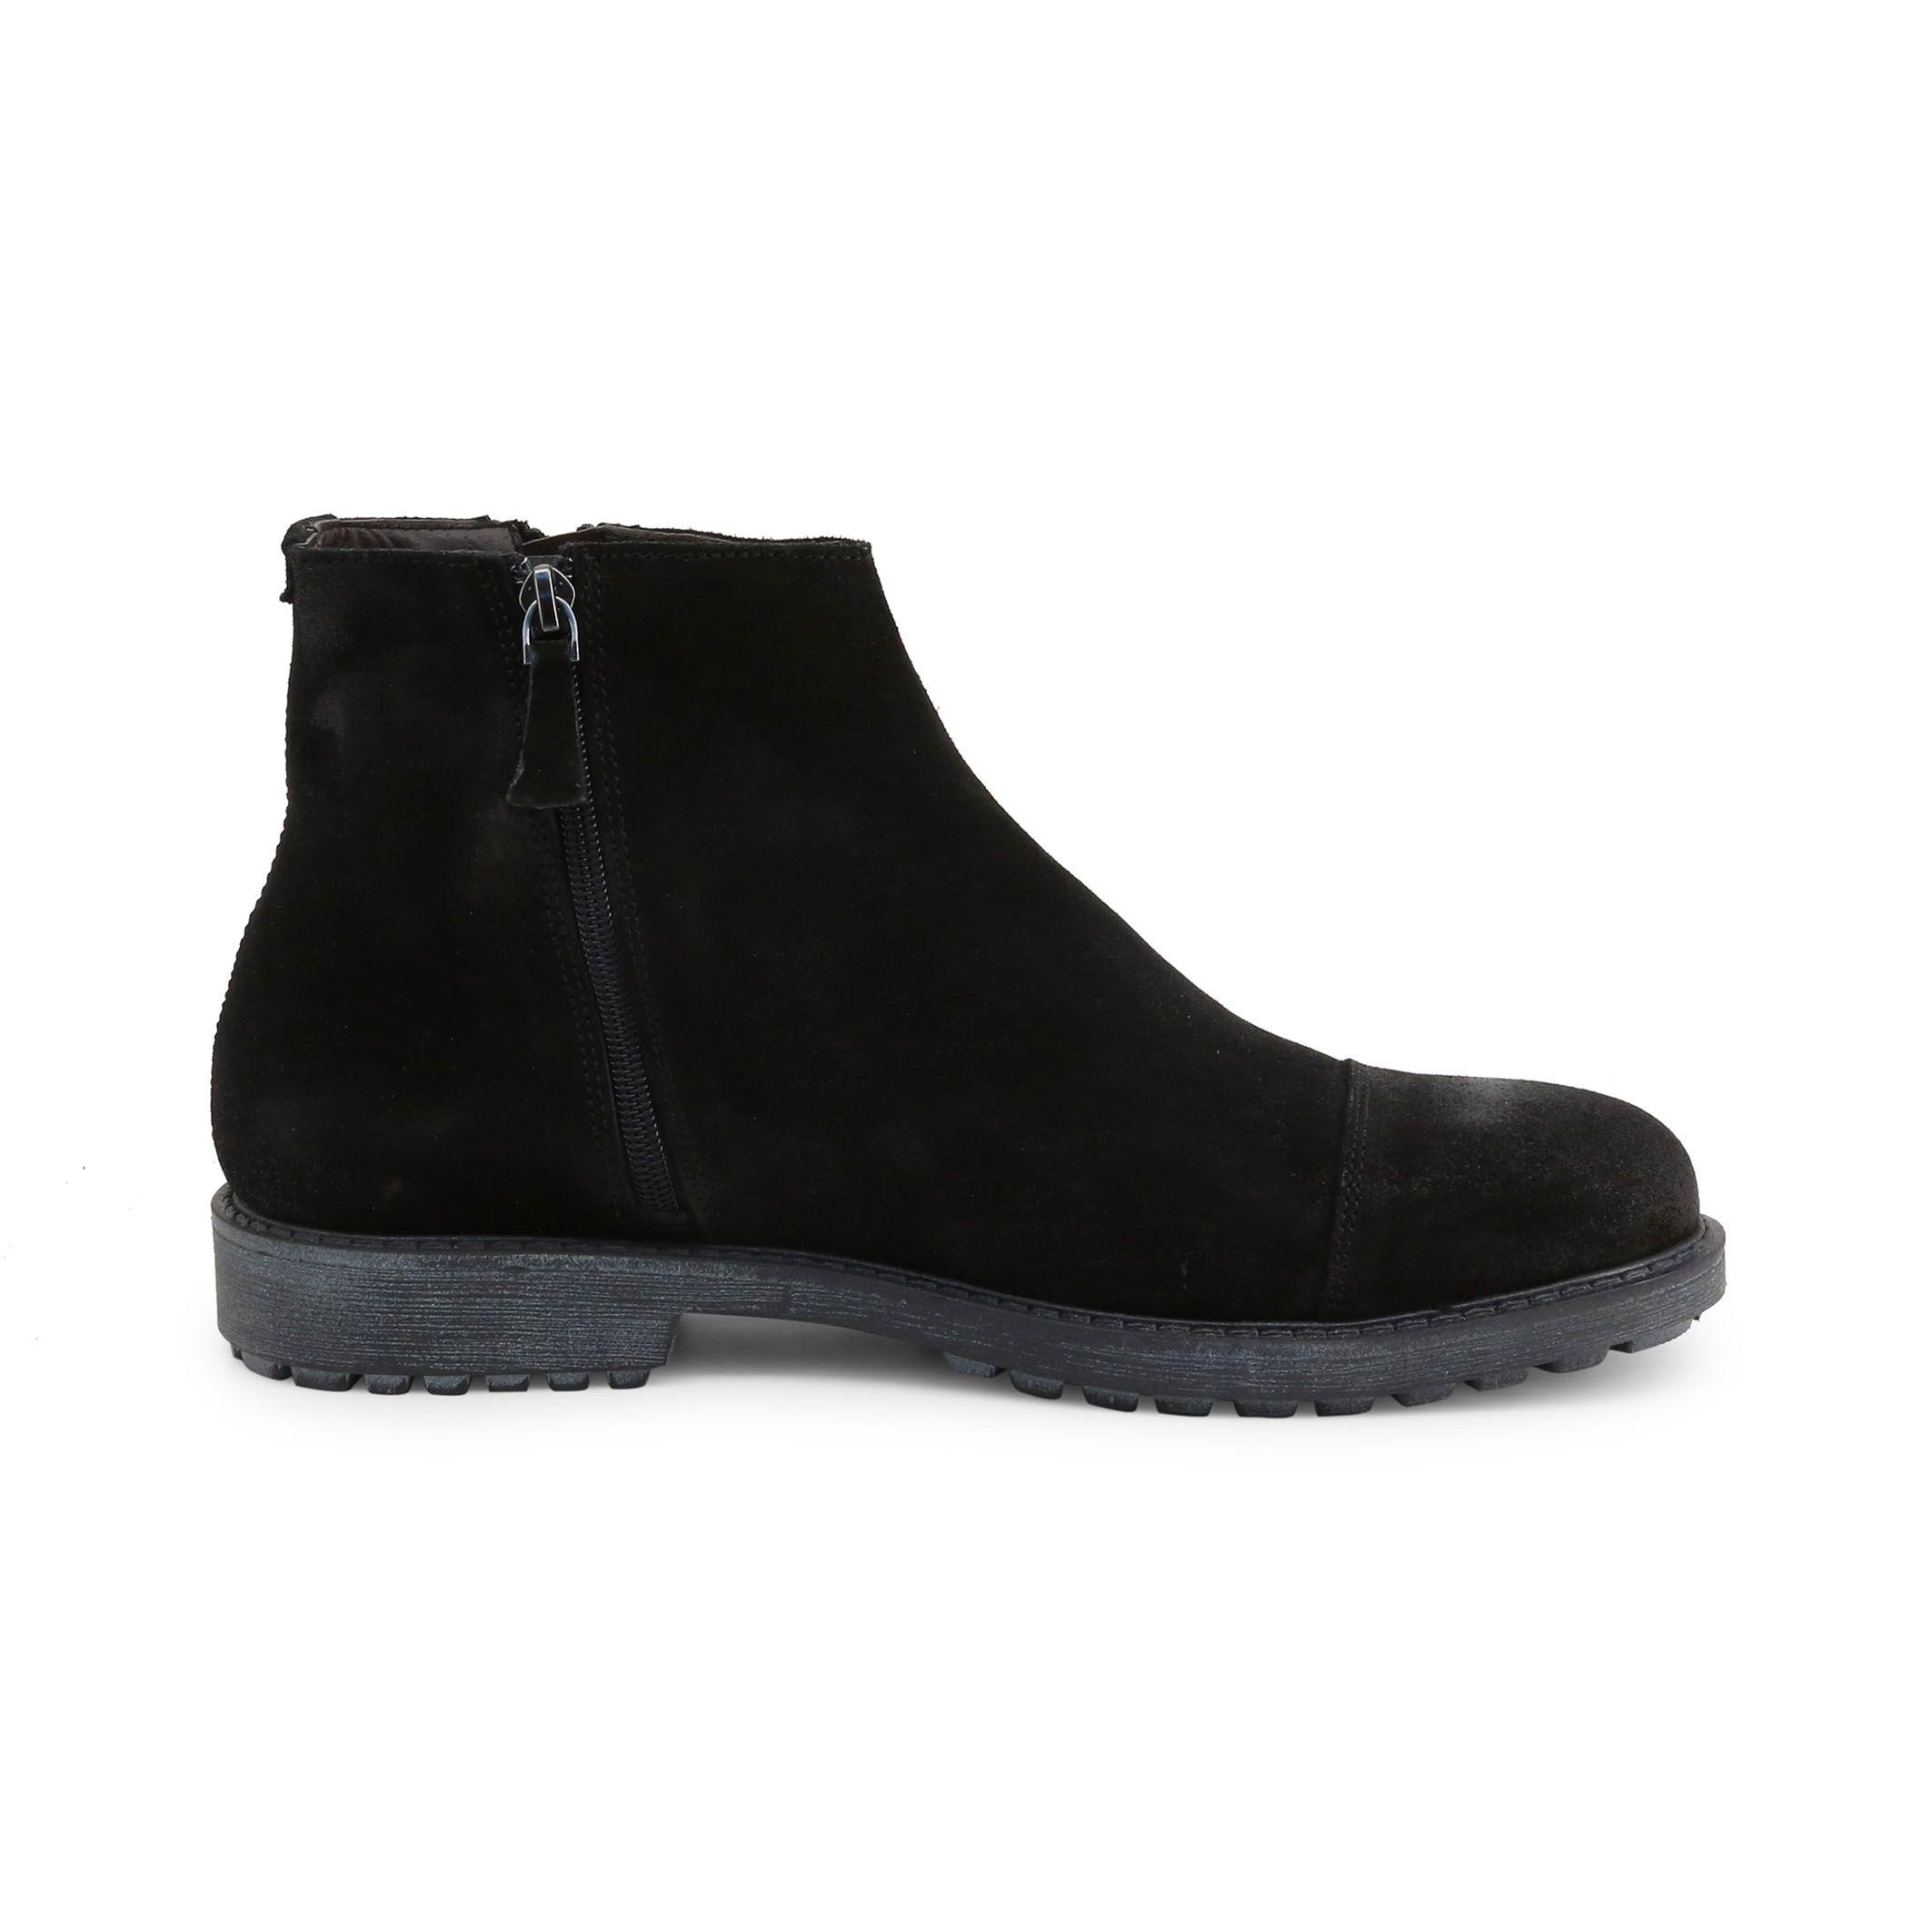 Schuhe Guido Bassi – 7849_CAMOSCIO – Schwarz